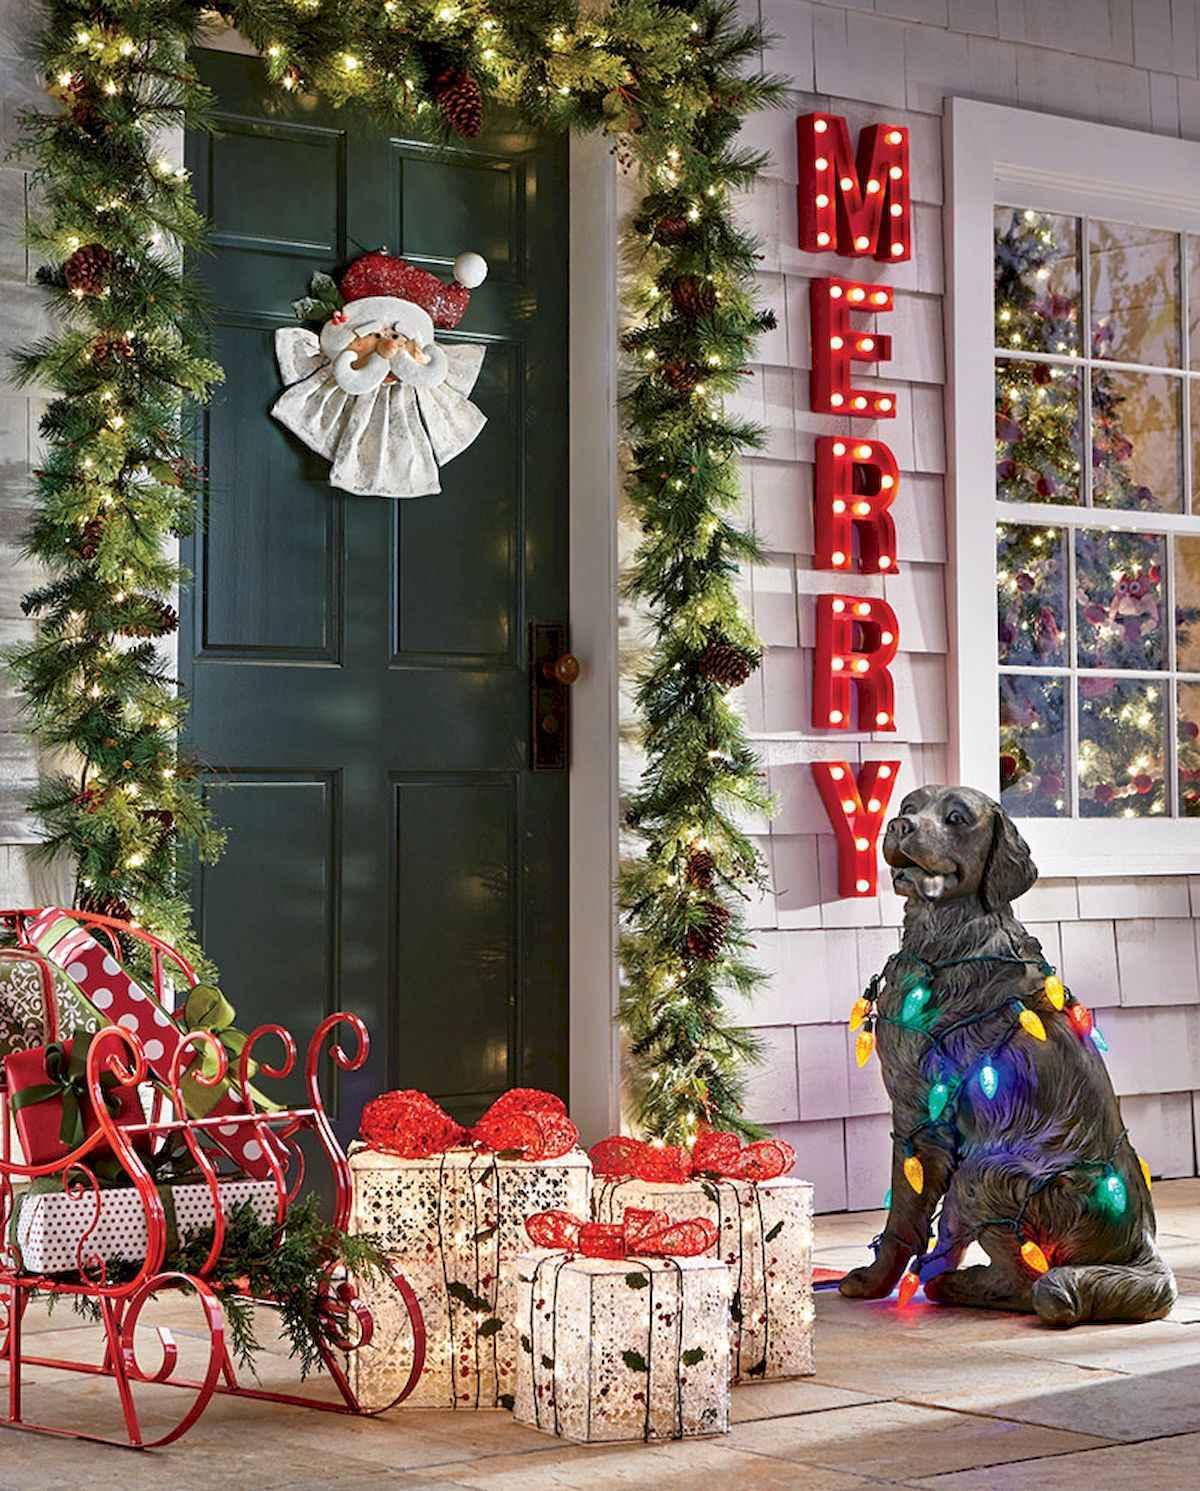 40 amazing outdoor christmas decorations ideas (23)